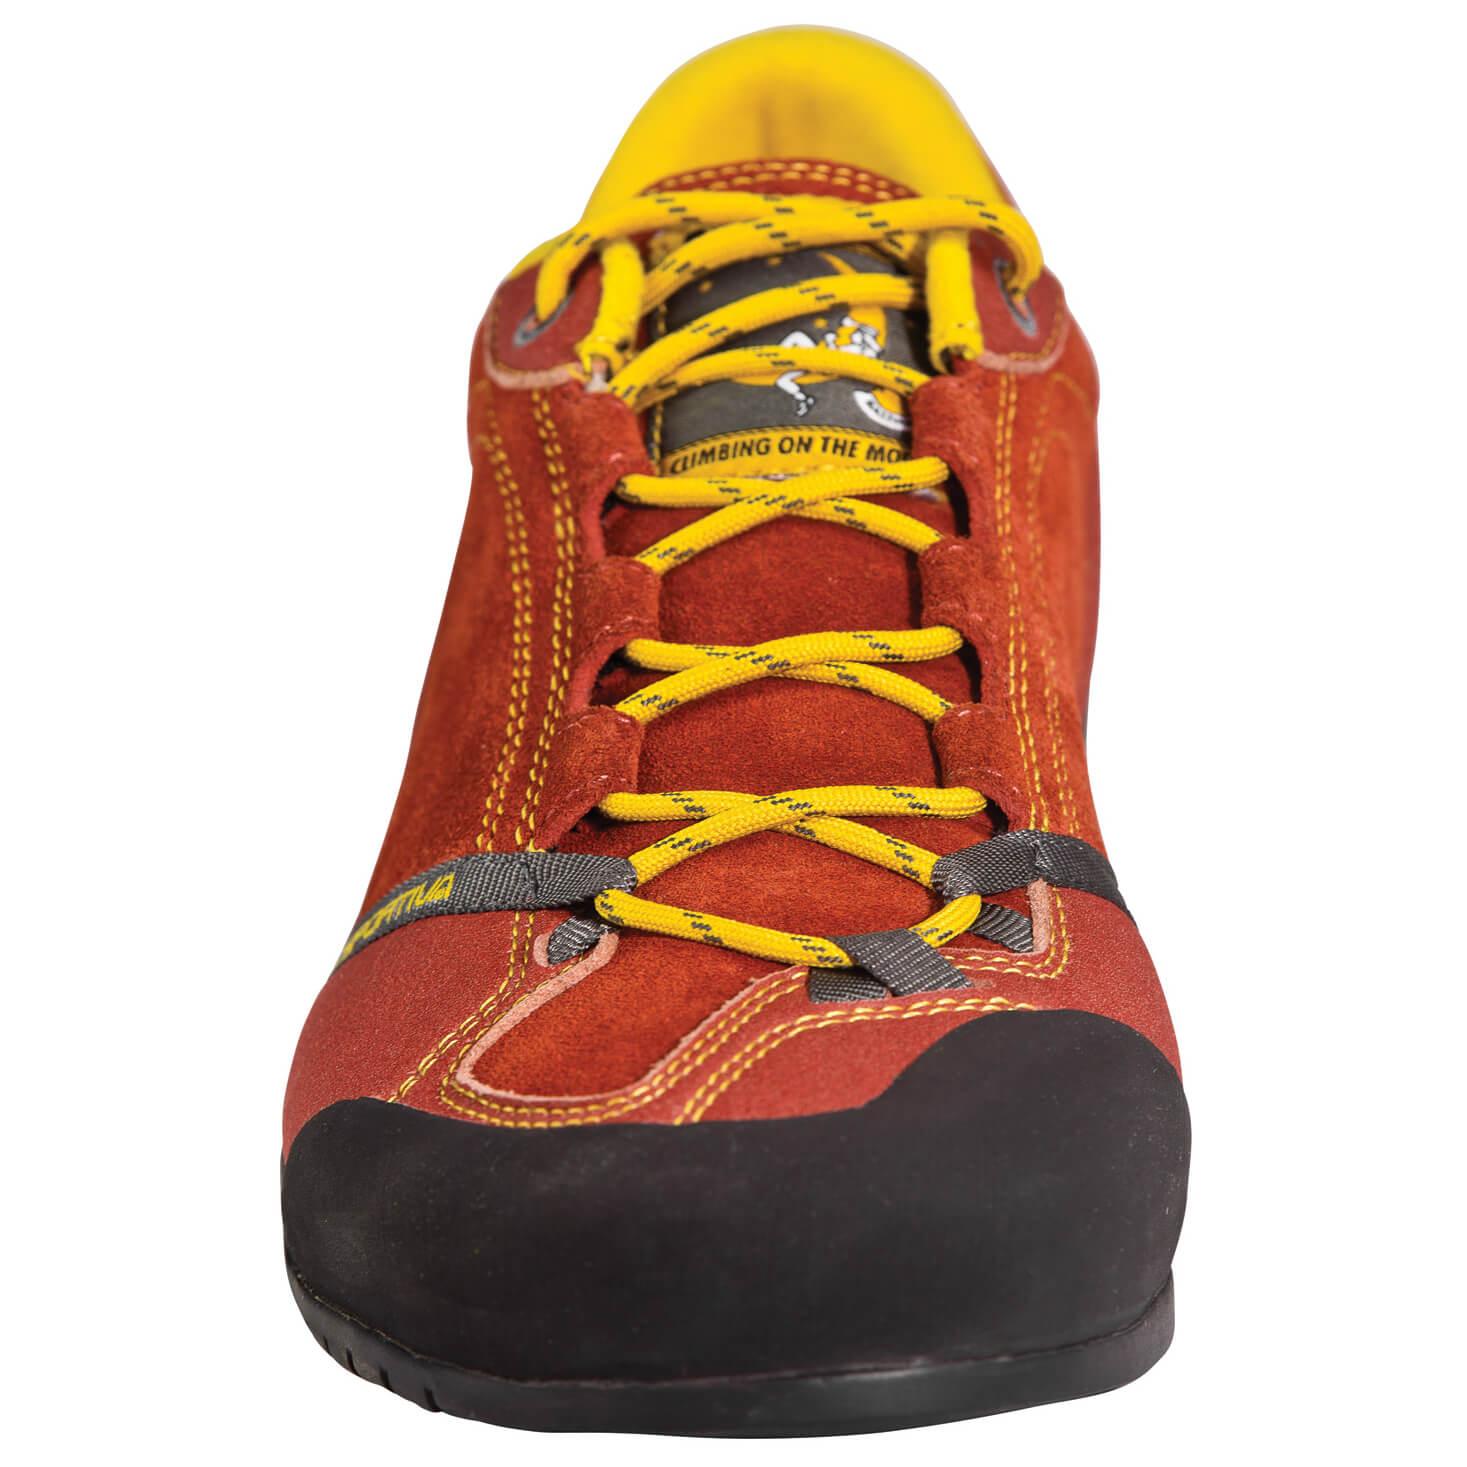 La Sportiva - Mix - Approach shoes | Free UK Delivery | Alpinetrek.co ...